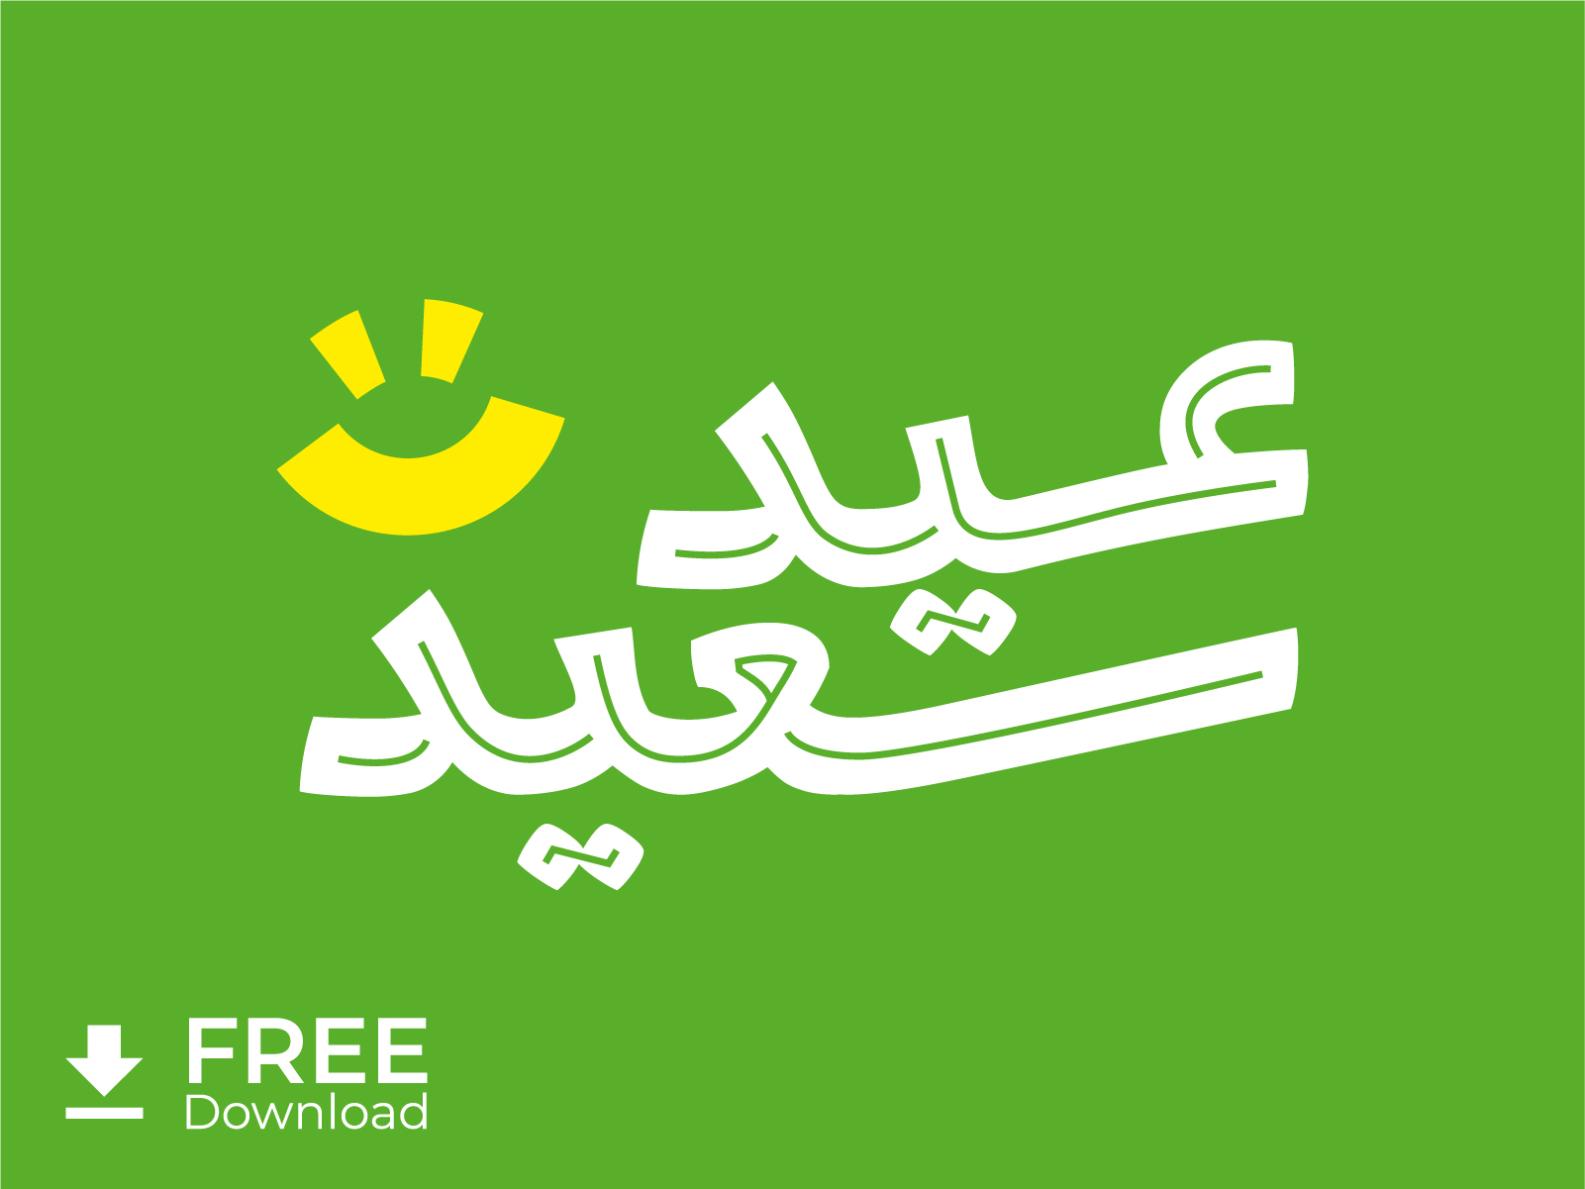 Eid Mubarak 1 Free Download By Mahmoud Elhosary On Dribbble